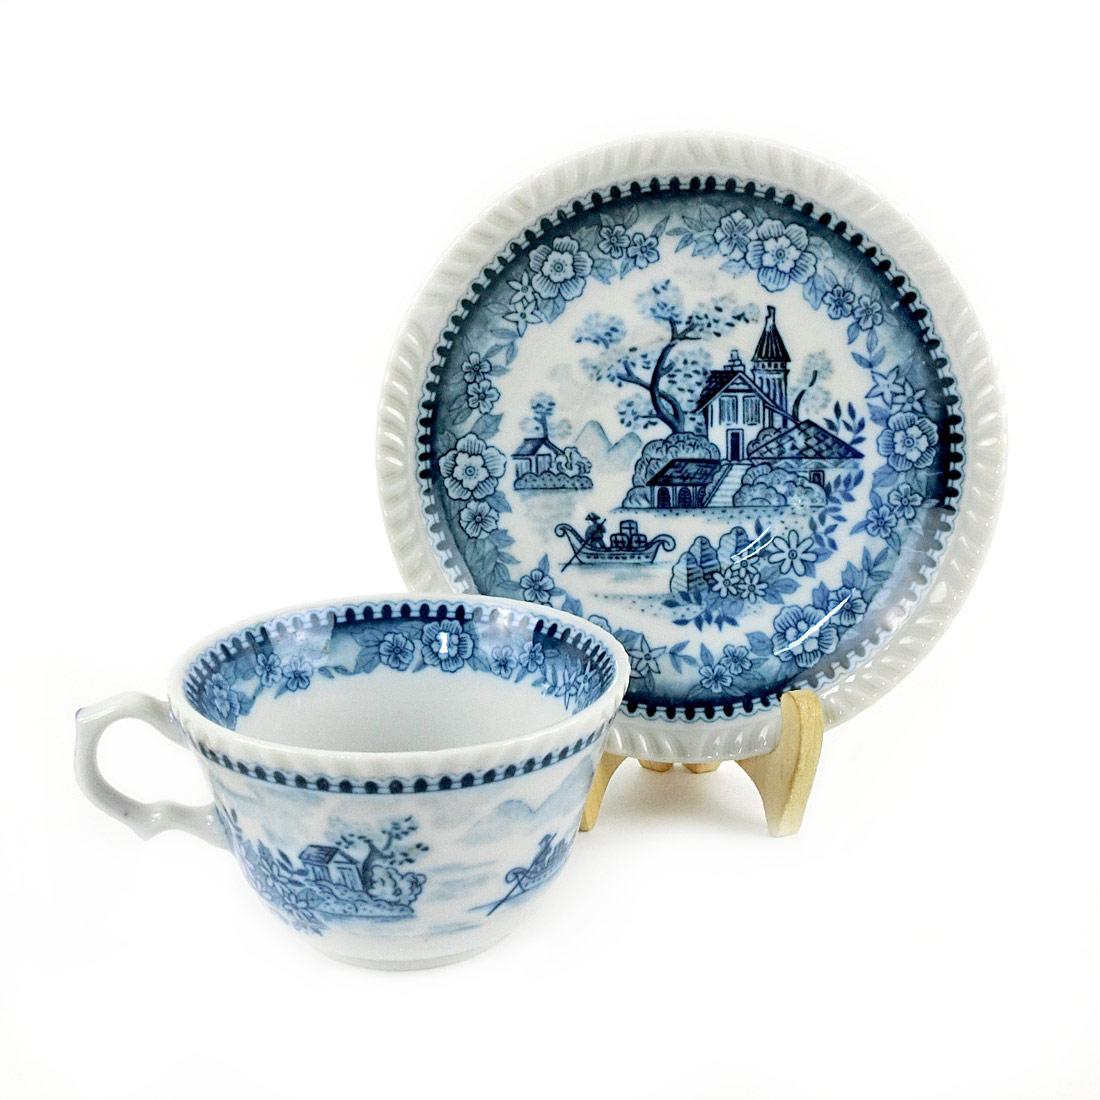 Set-tra-phong-canh-men-lam-Khong-Trien-31421-2